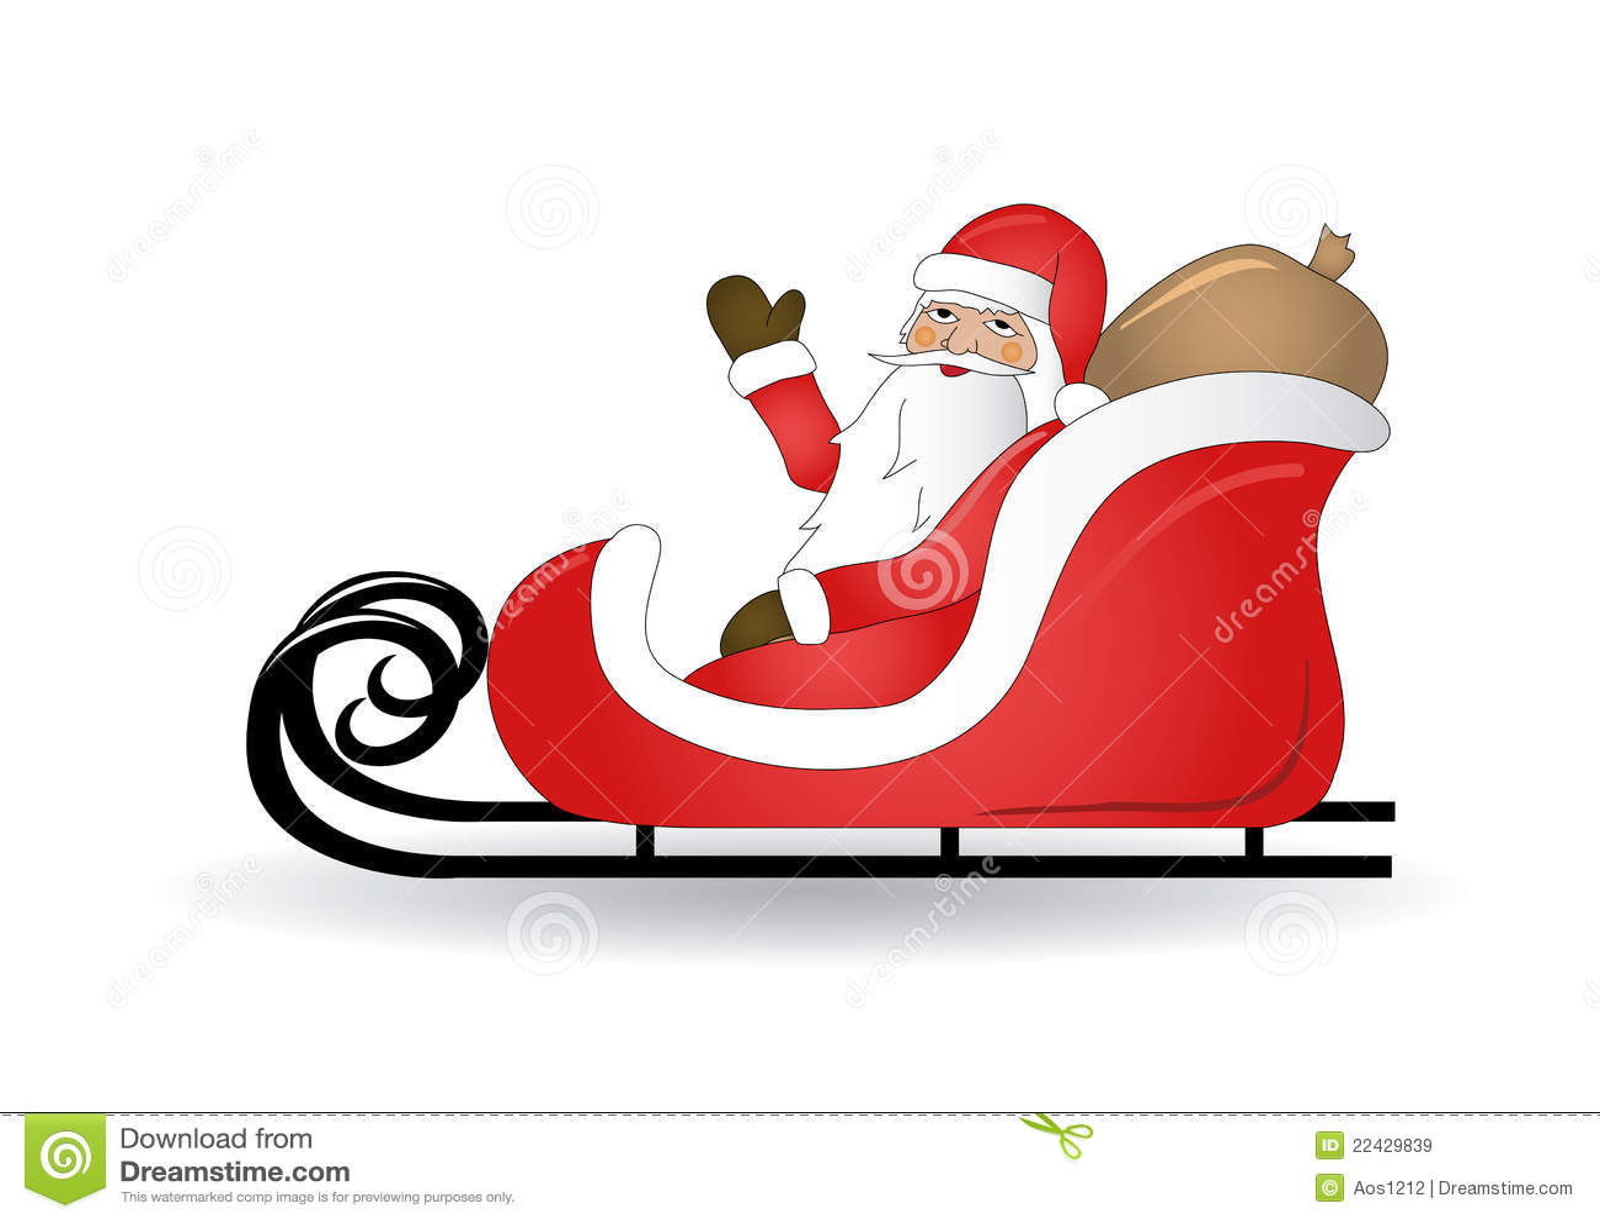 Free Clipart Christmas Sleigh